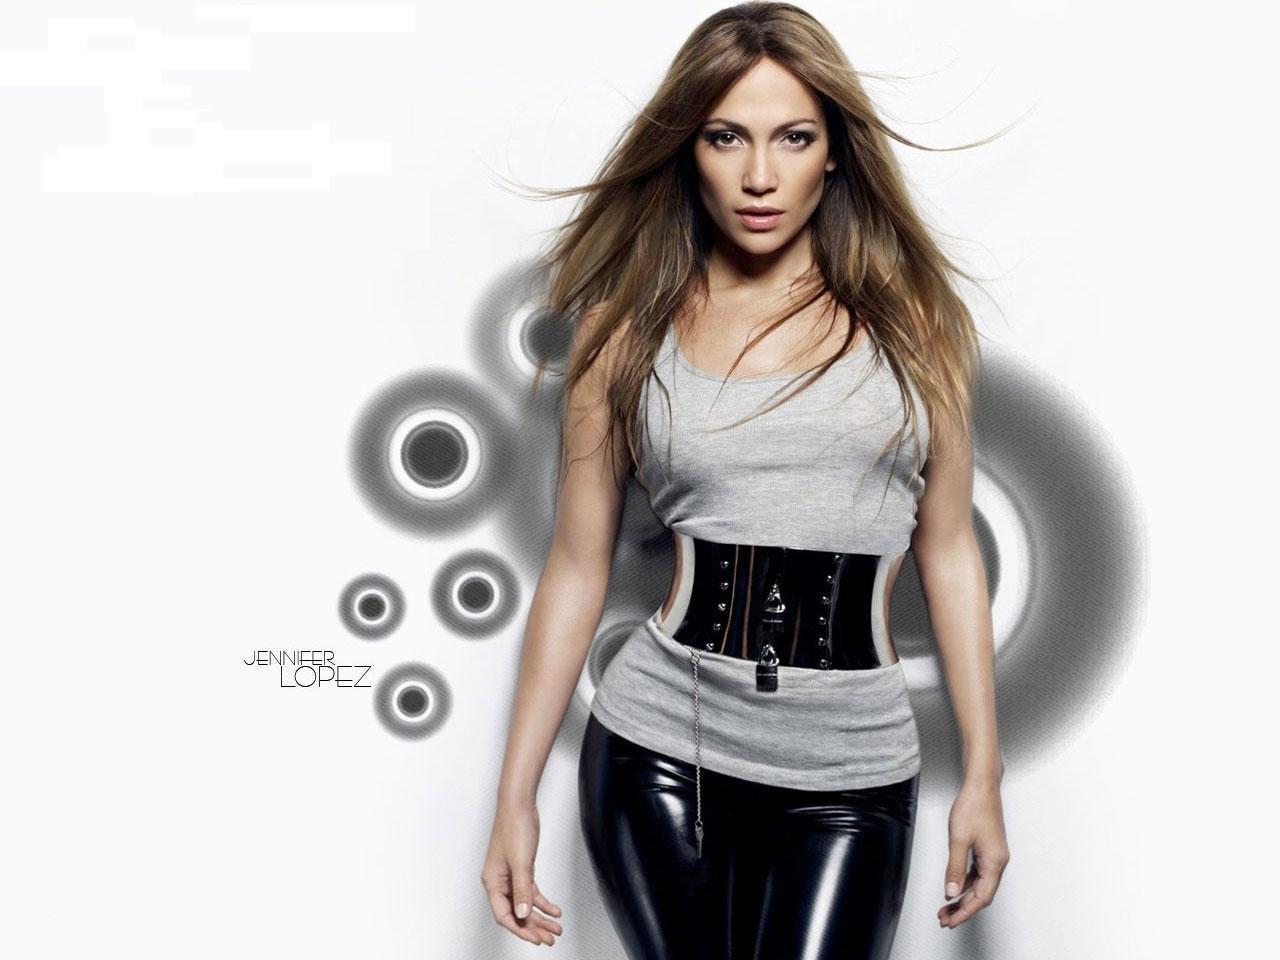 http://2.bp.blogspot.com/-PIWWRJ5SyhM/T1GrUu3E5pI/AAAAAAAAGyI/-NBCPQZ3dZQ/s1600/Jennifer-Lopez-hd-wallpapers.jpg